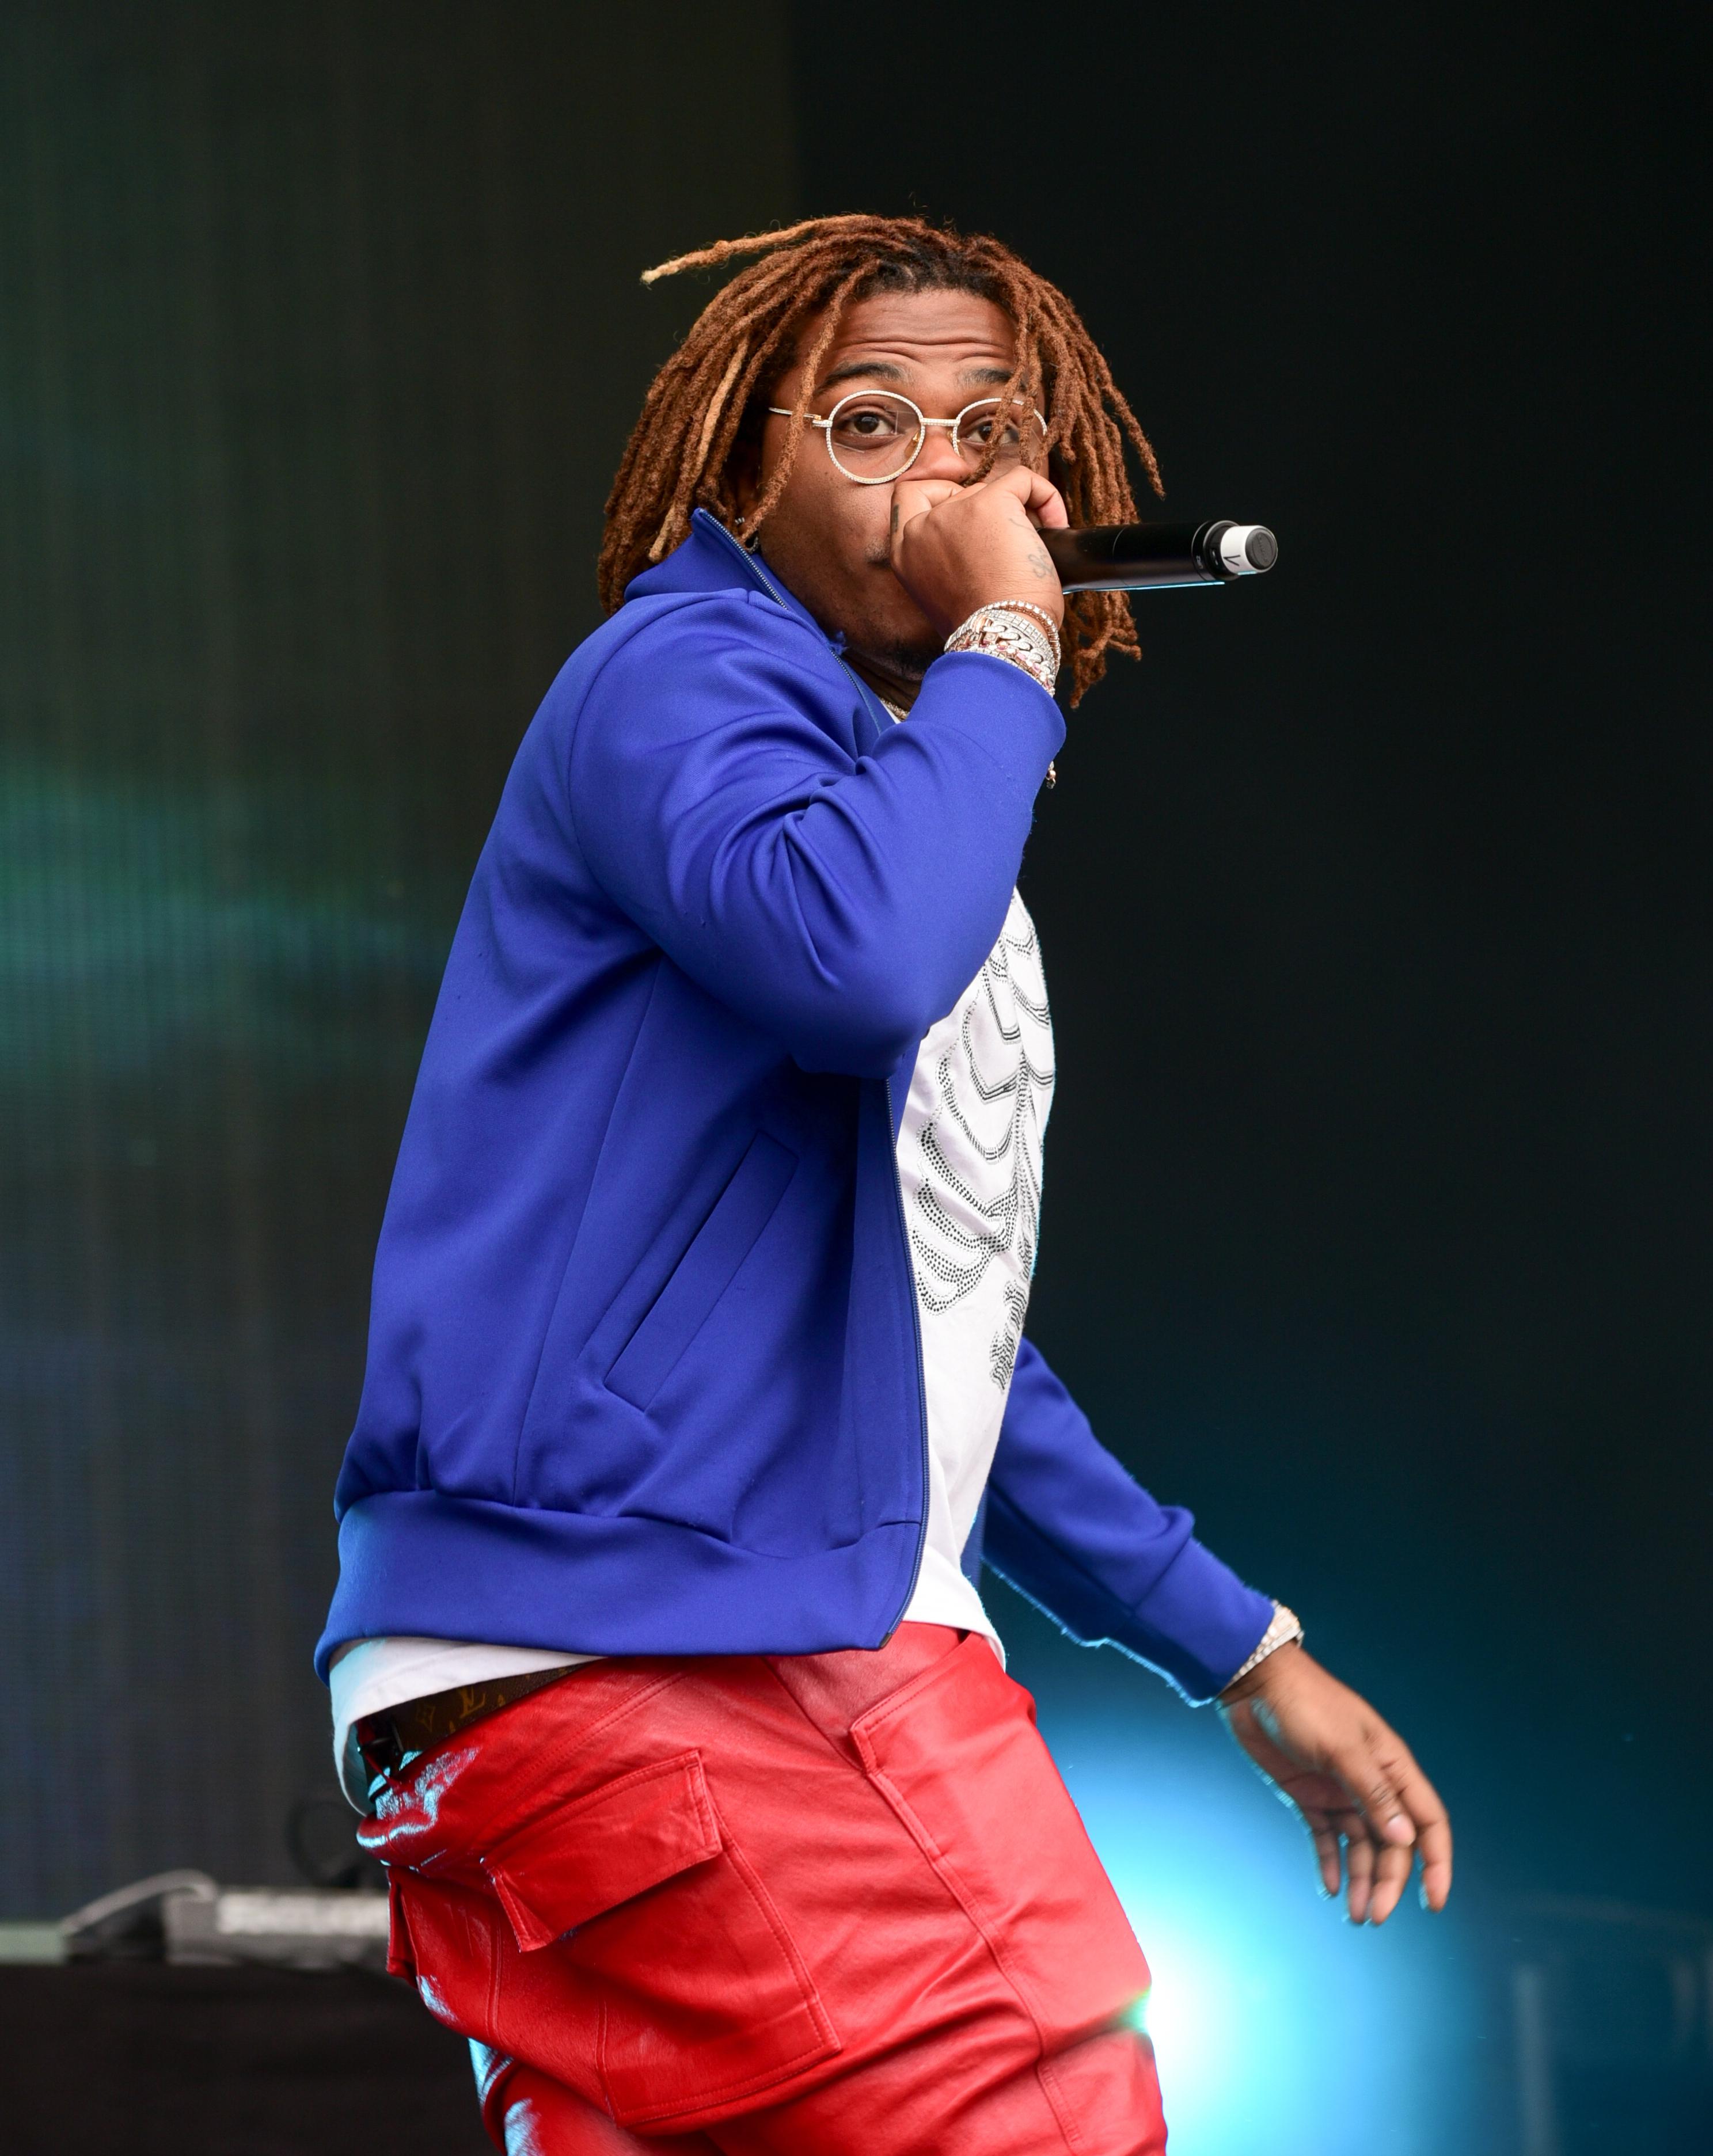 Gunna (rapper) - Wikipedia